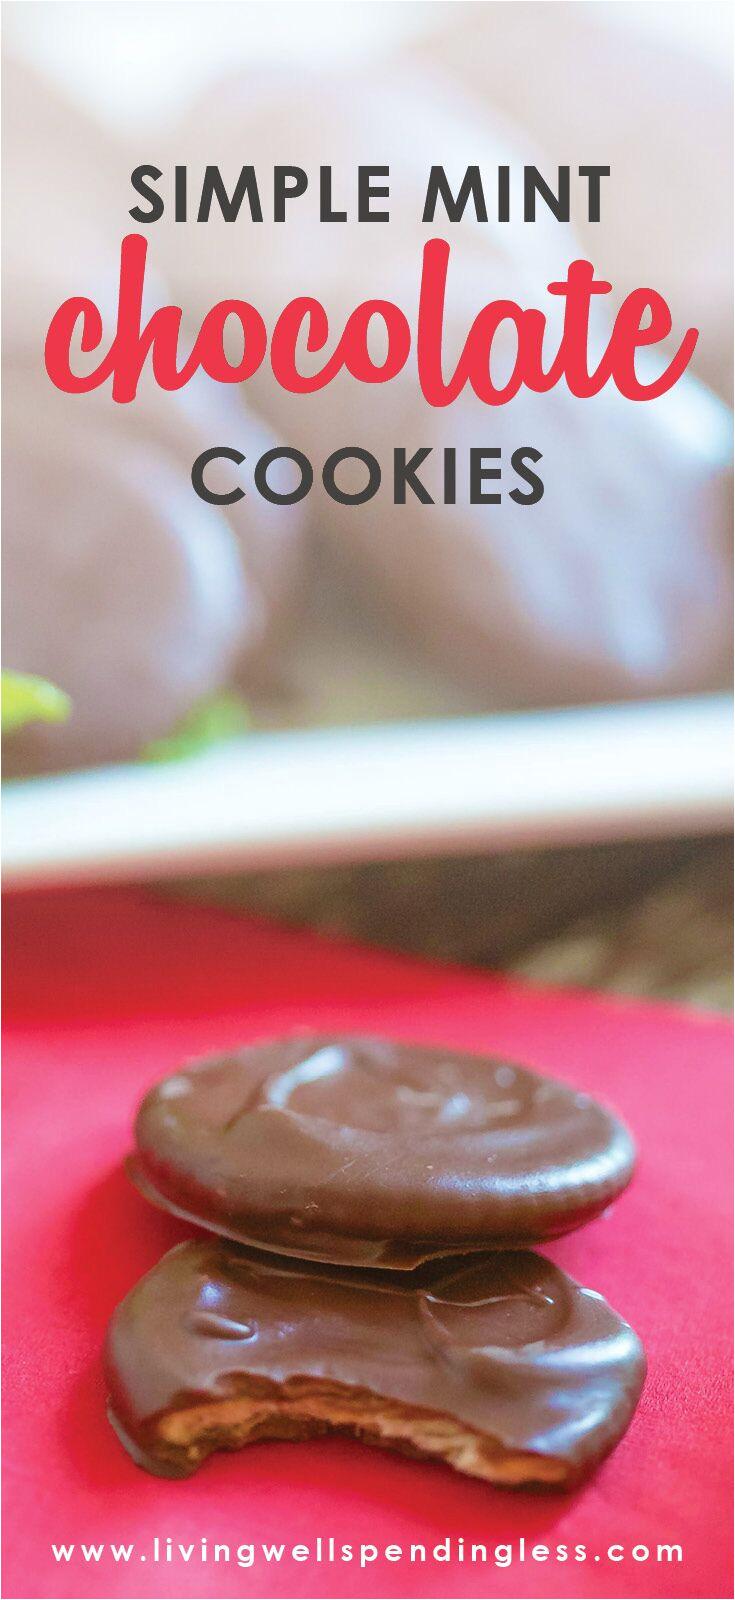 simple chocolate mint cookies 5 ingredients or less dessert food made simple